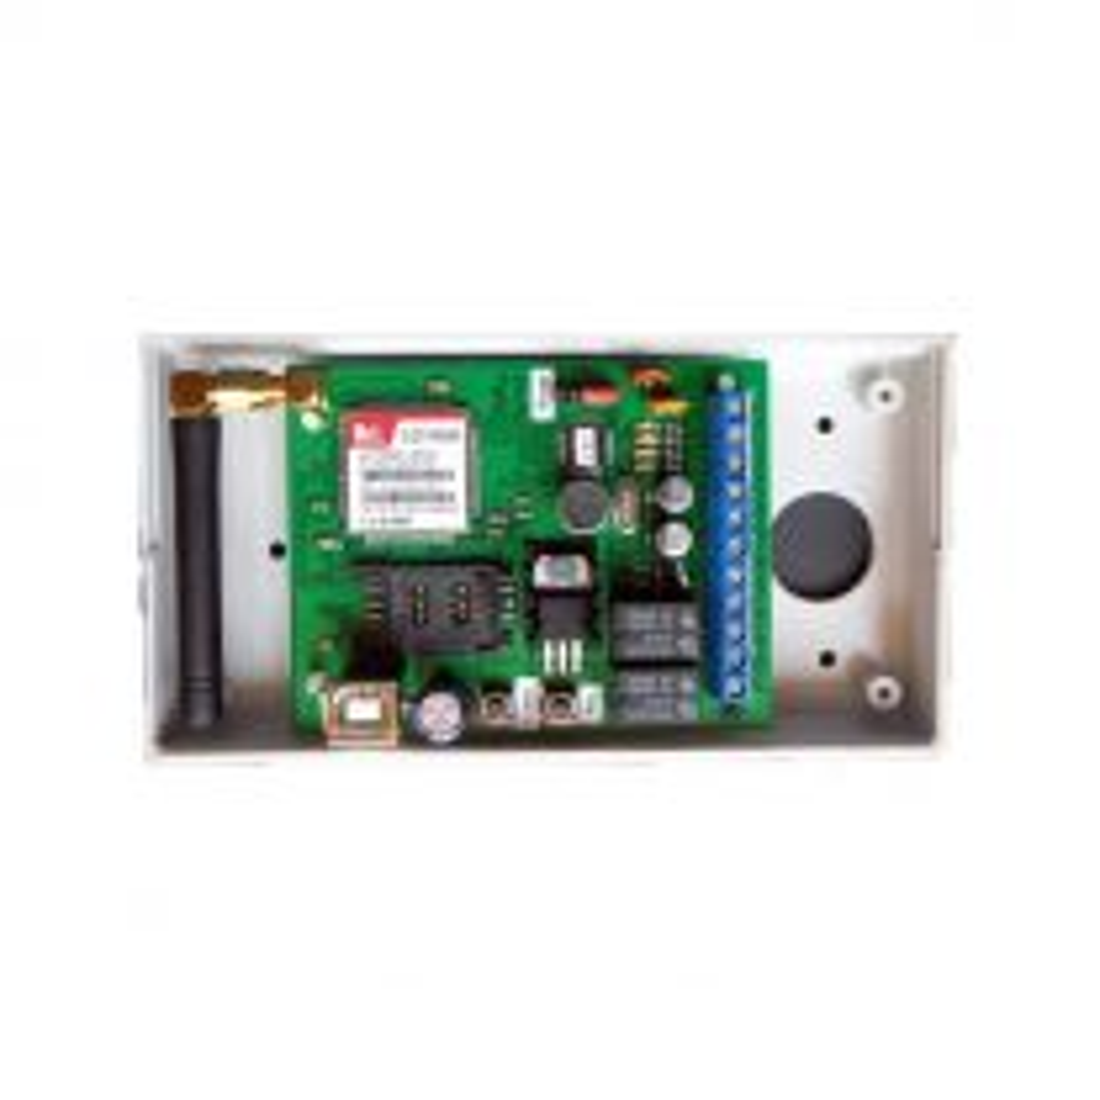 FVK 22 vox USB s plastovou krabičkou